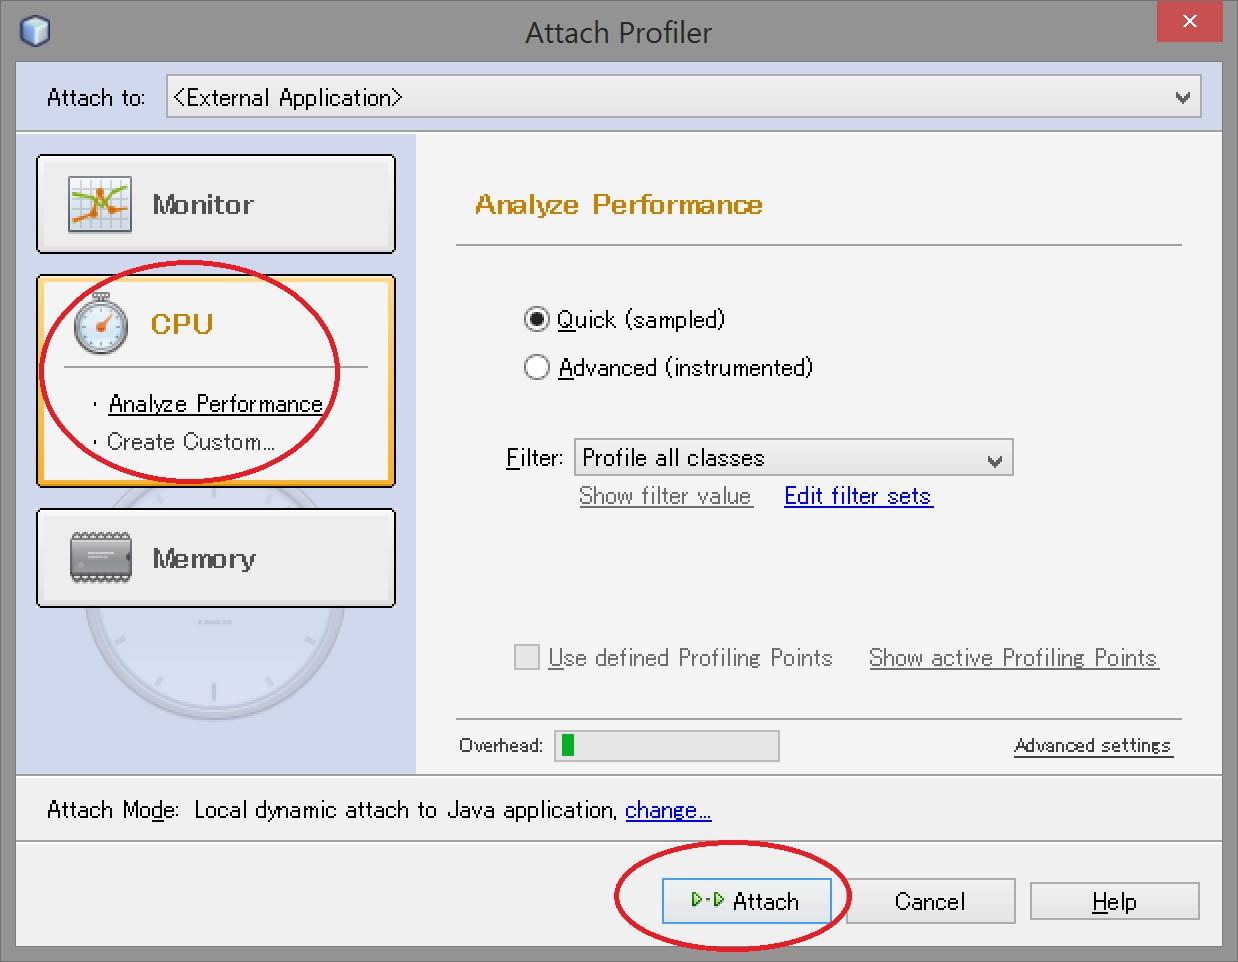 Attach Profiler - step 2